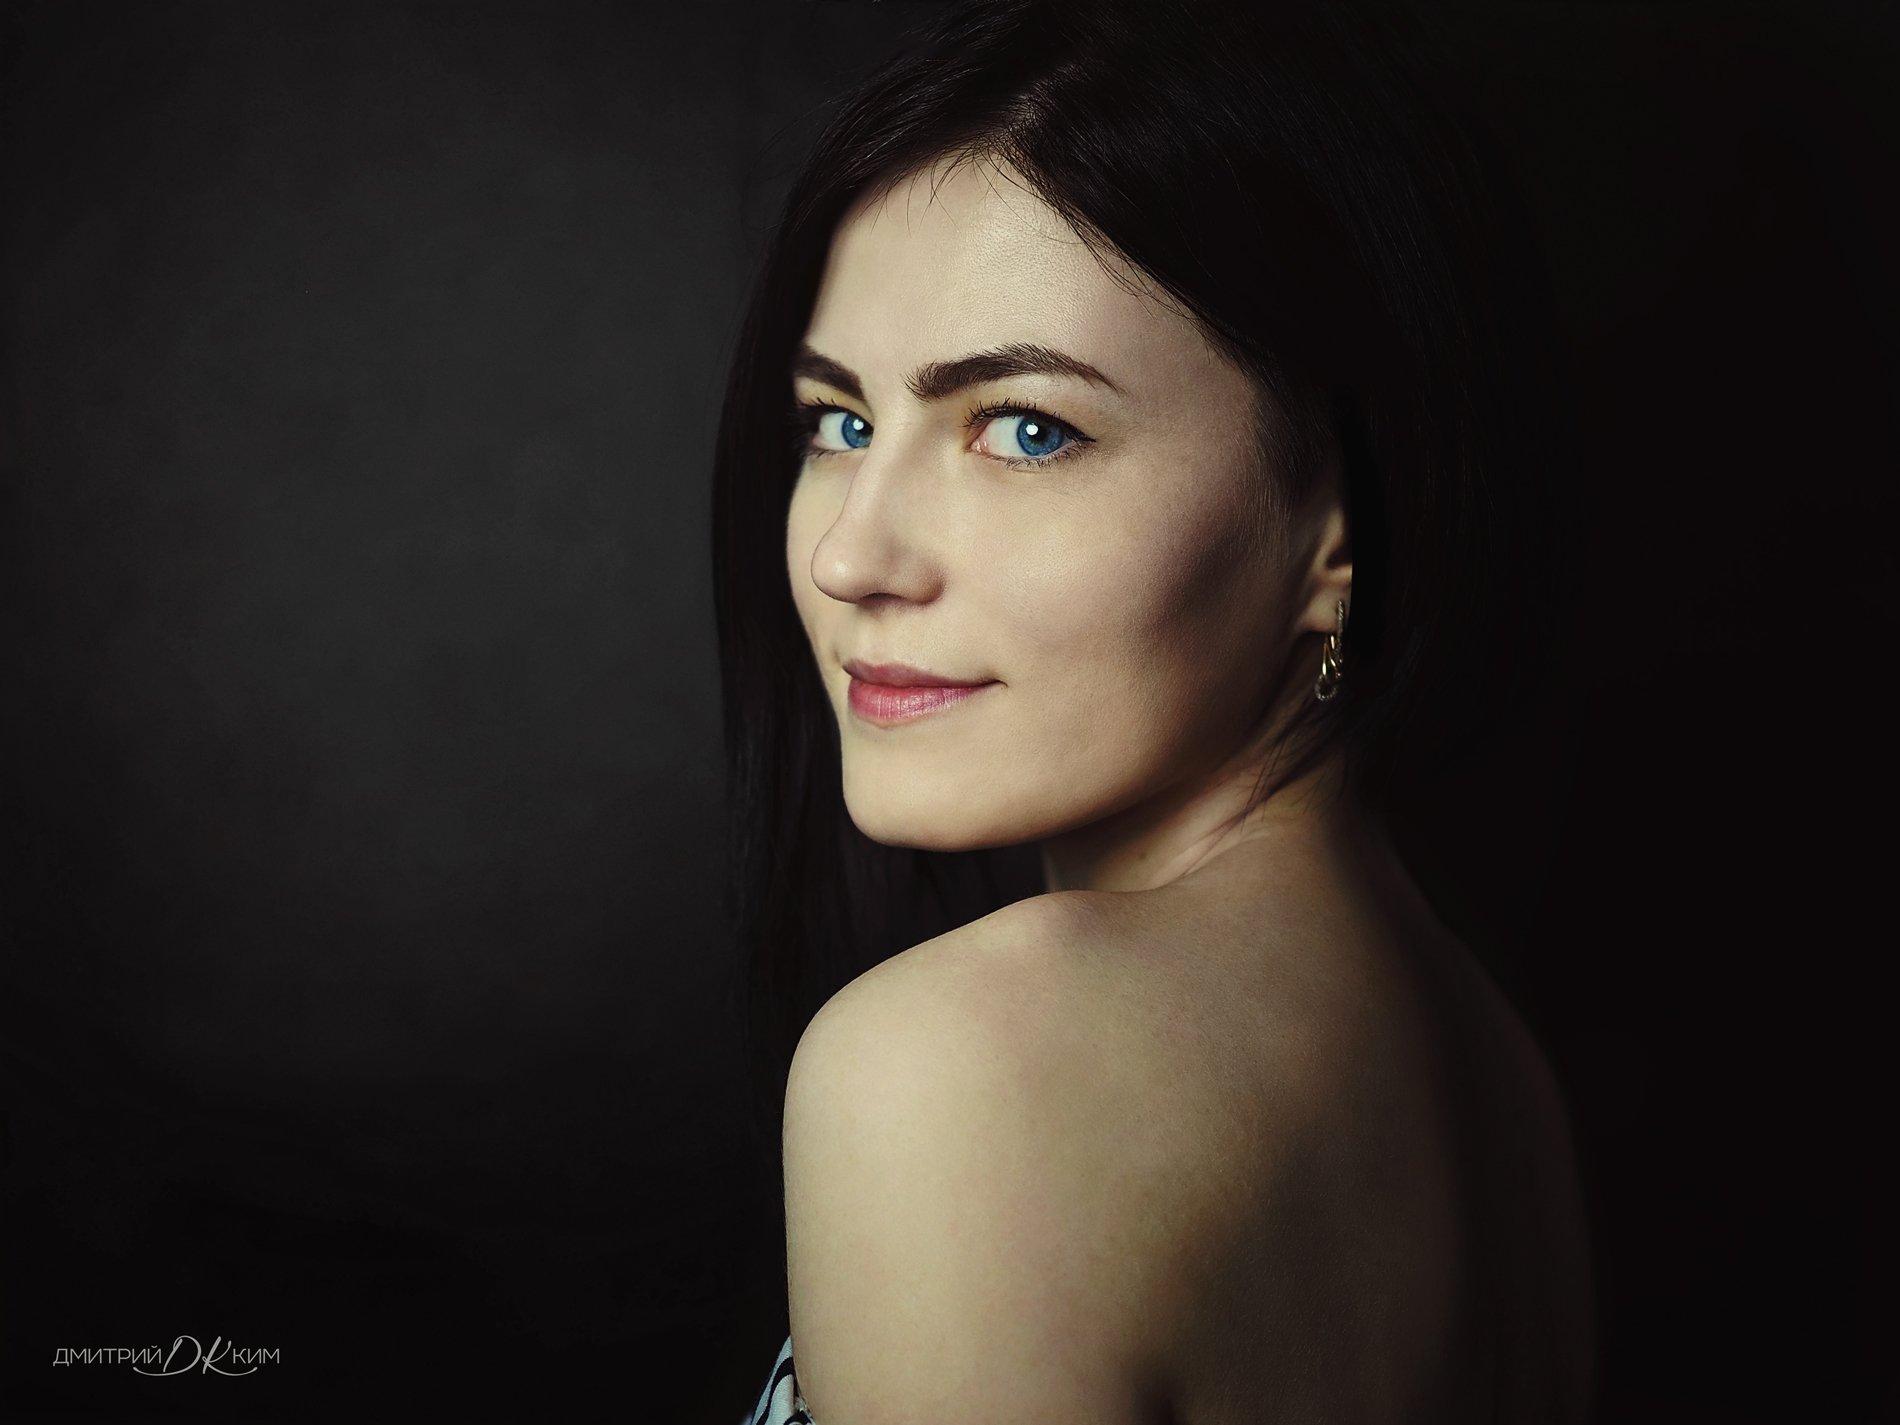 olympus, kazakhstan, kostanay, Дмитрий Ким